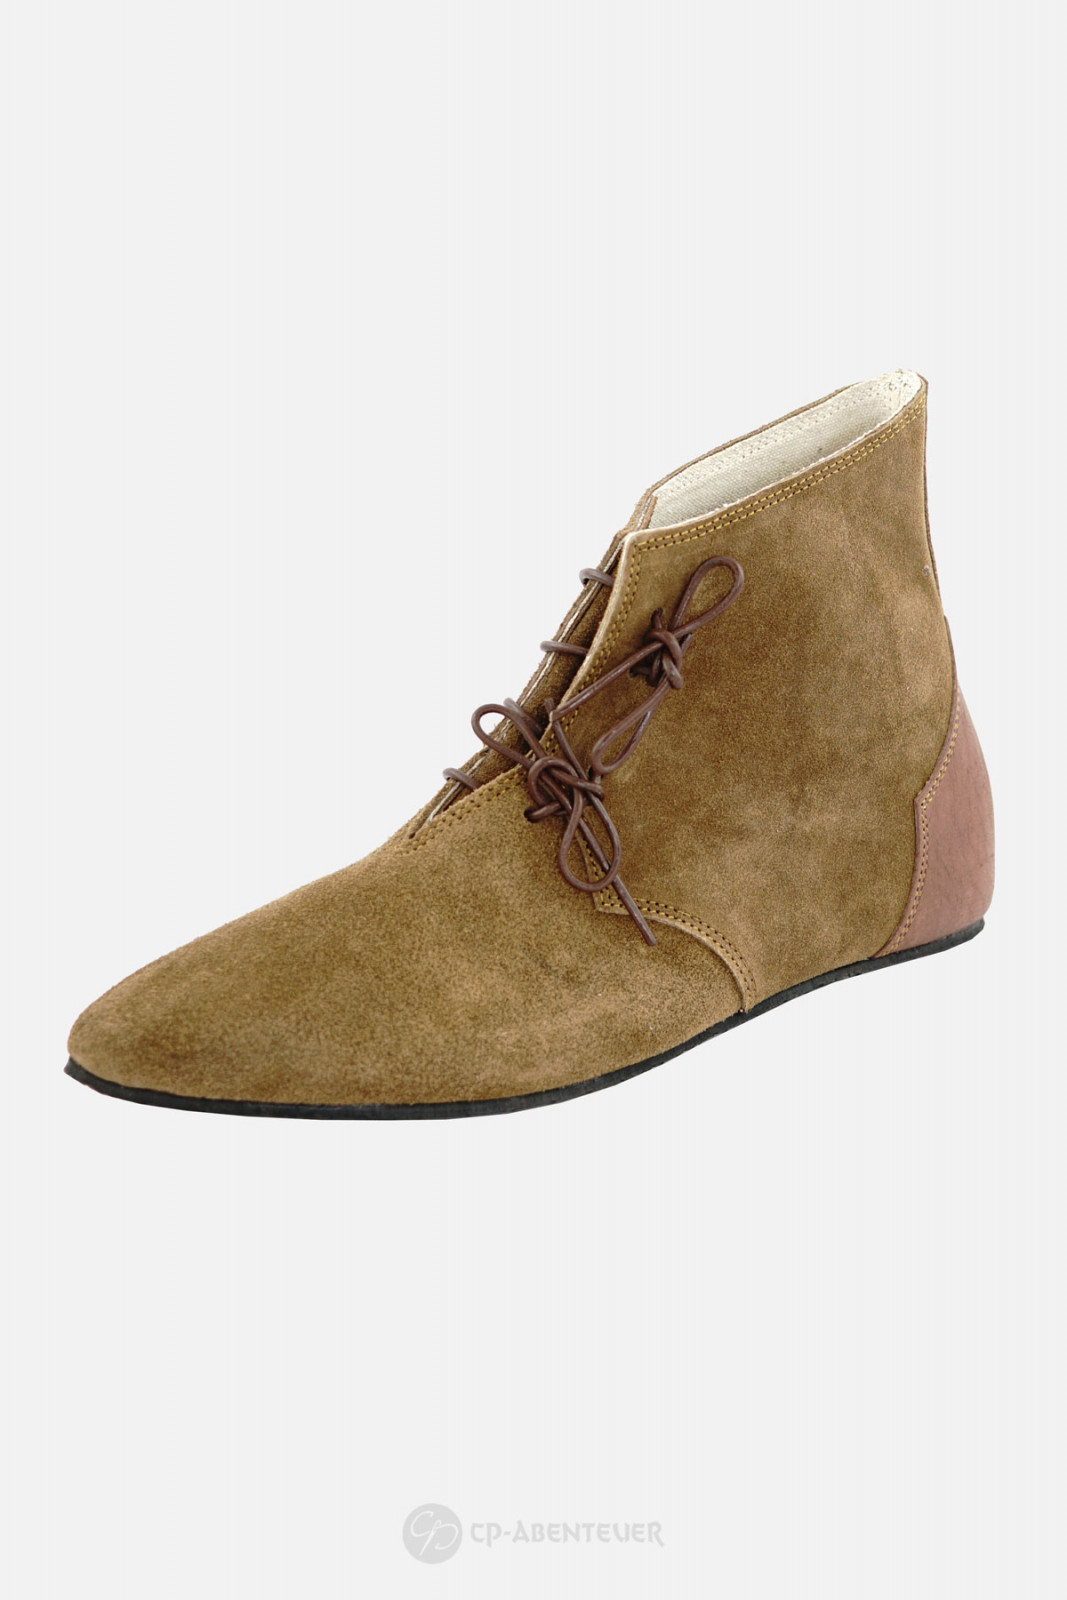 Hanning - Schuhe, Braun